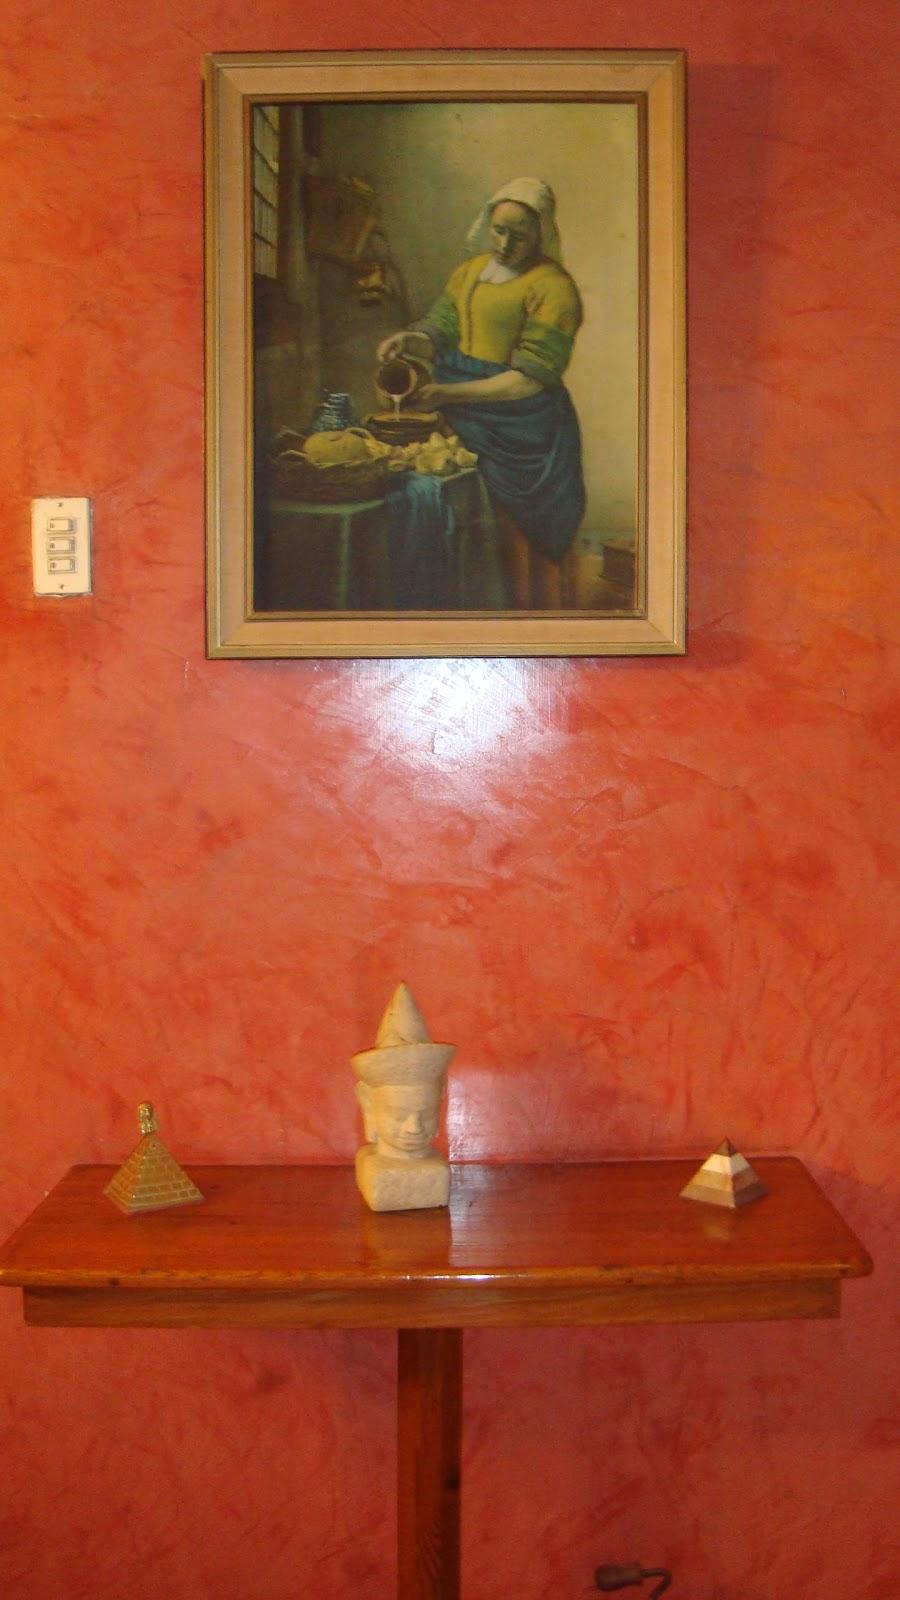 Decoroma pinturas decorativas - Pintar sobre estuco veneciano ...